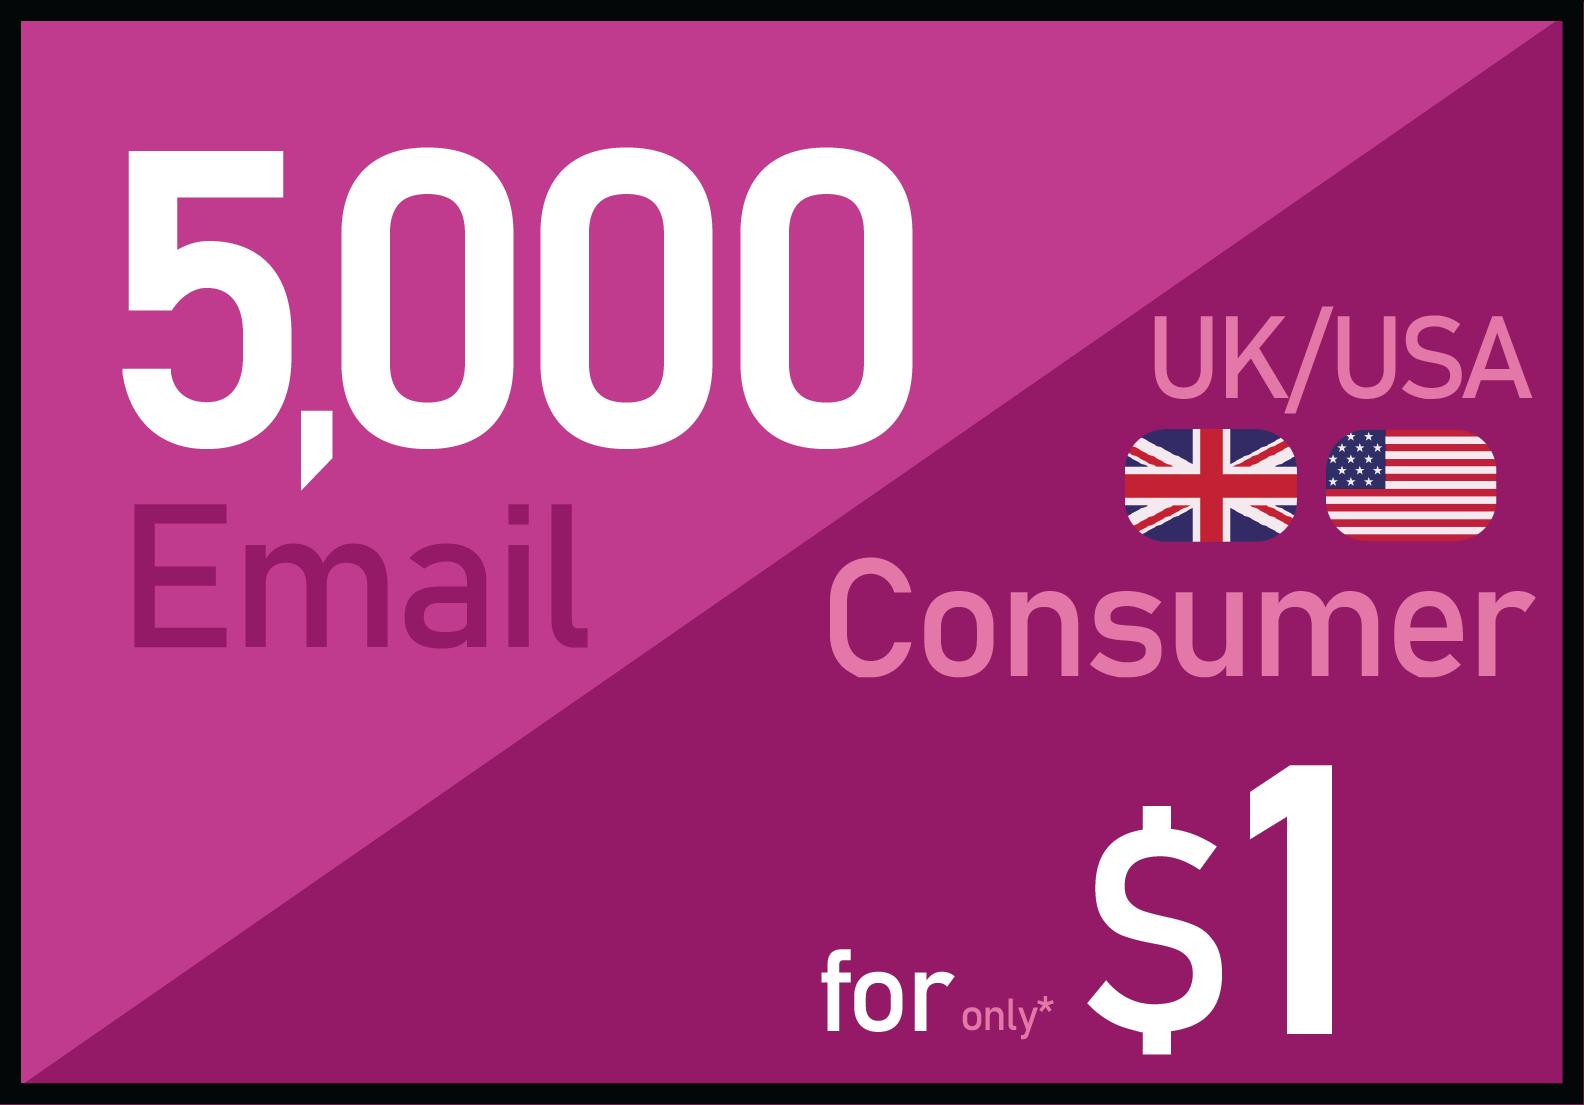 5,000 UK/USA Consumer Email List